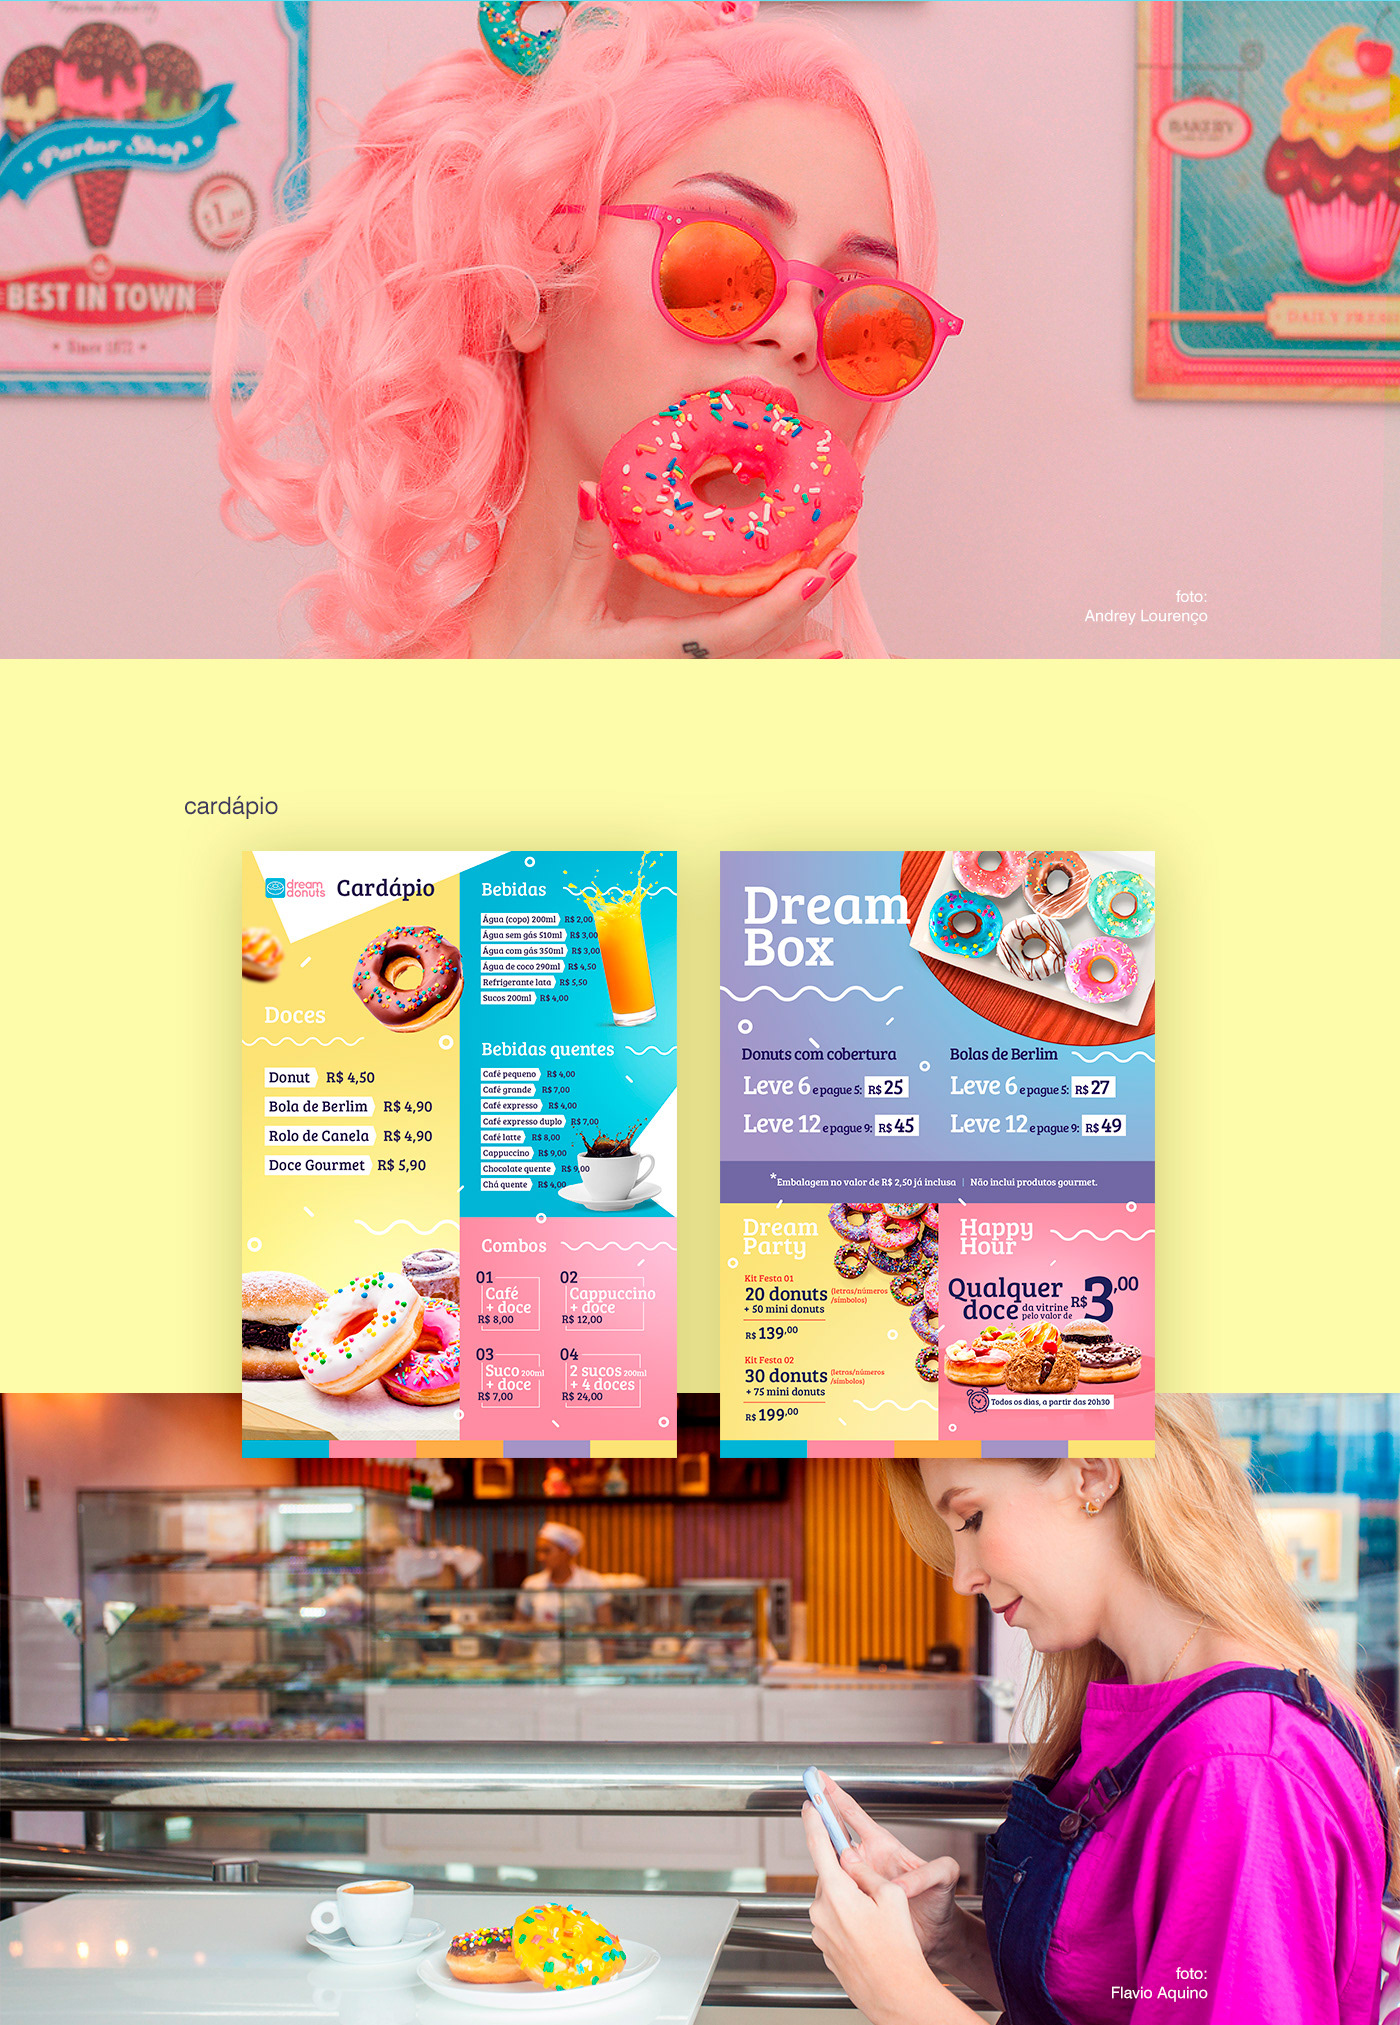 sweet bright colorful Candy doughnut branding  cheerful social media